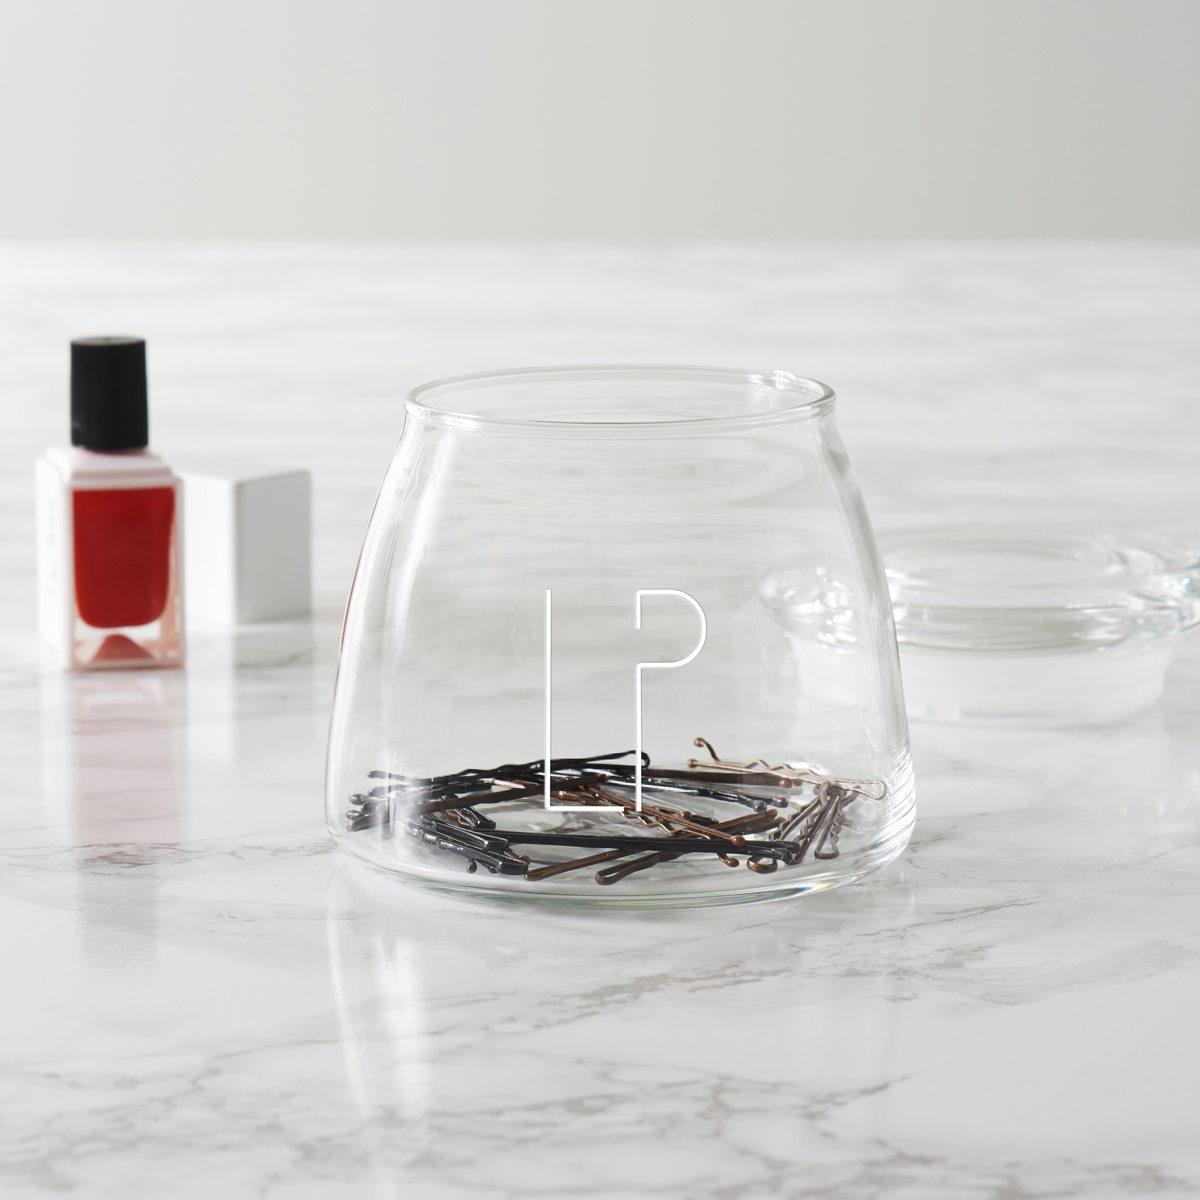 Personalised Initials Beauty Storage Jar